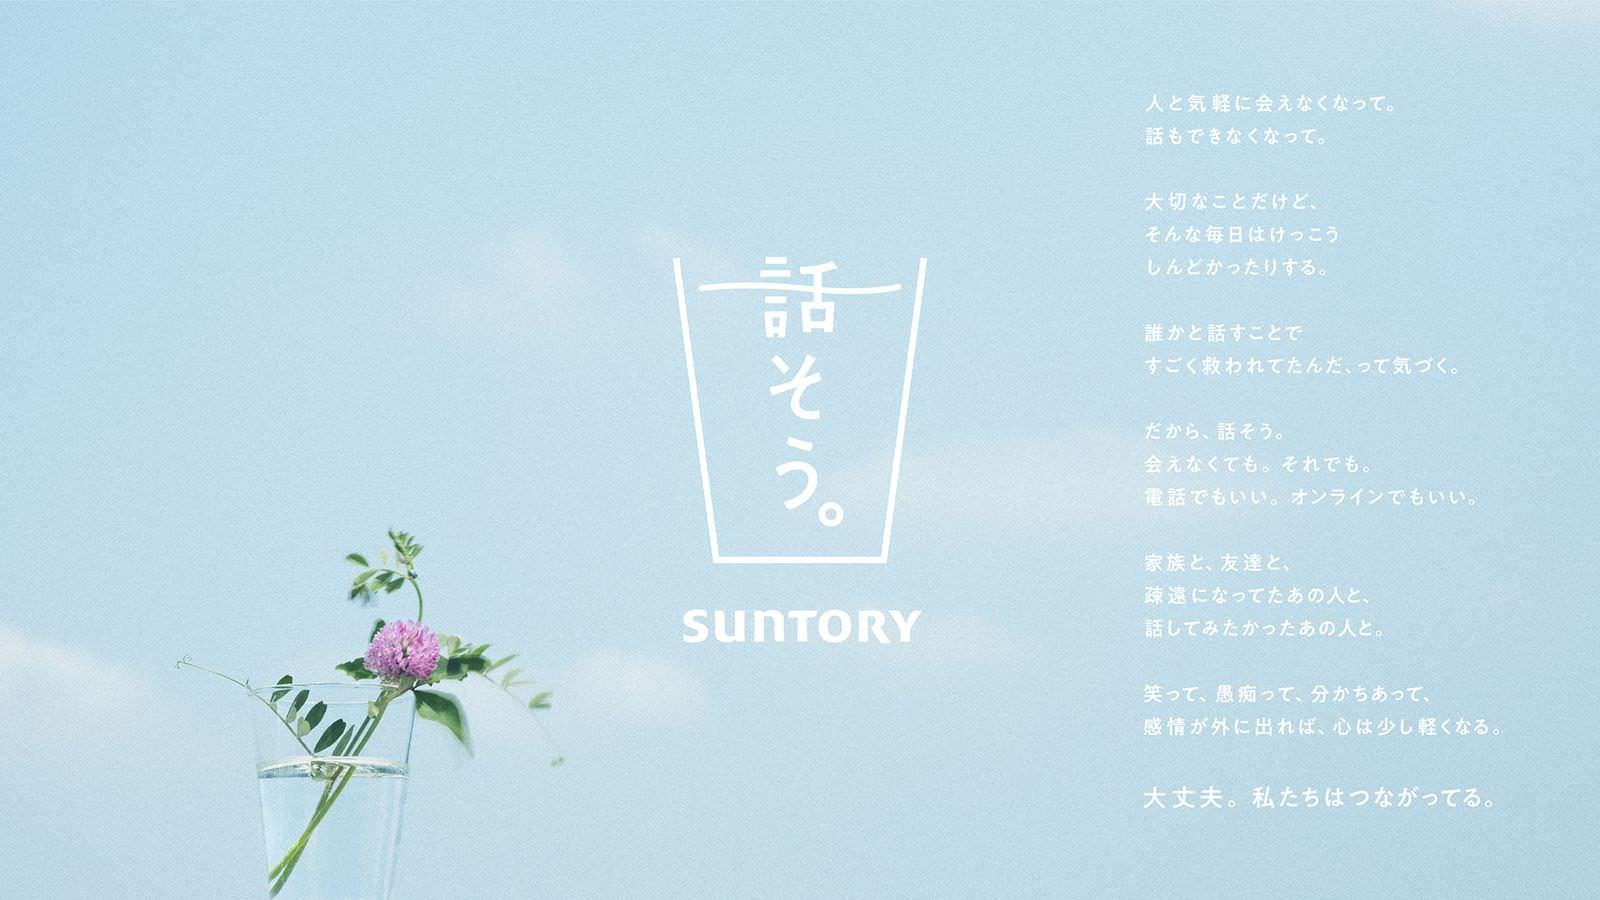 https://dentsulab.tokyo/works/wp-content/uploads/sites/3/2020/09/suntory_hanasou_7.jpeg